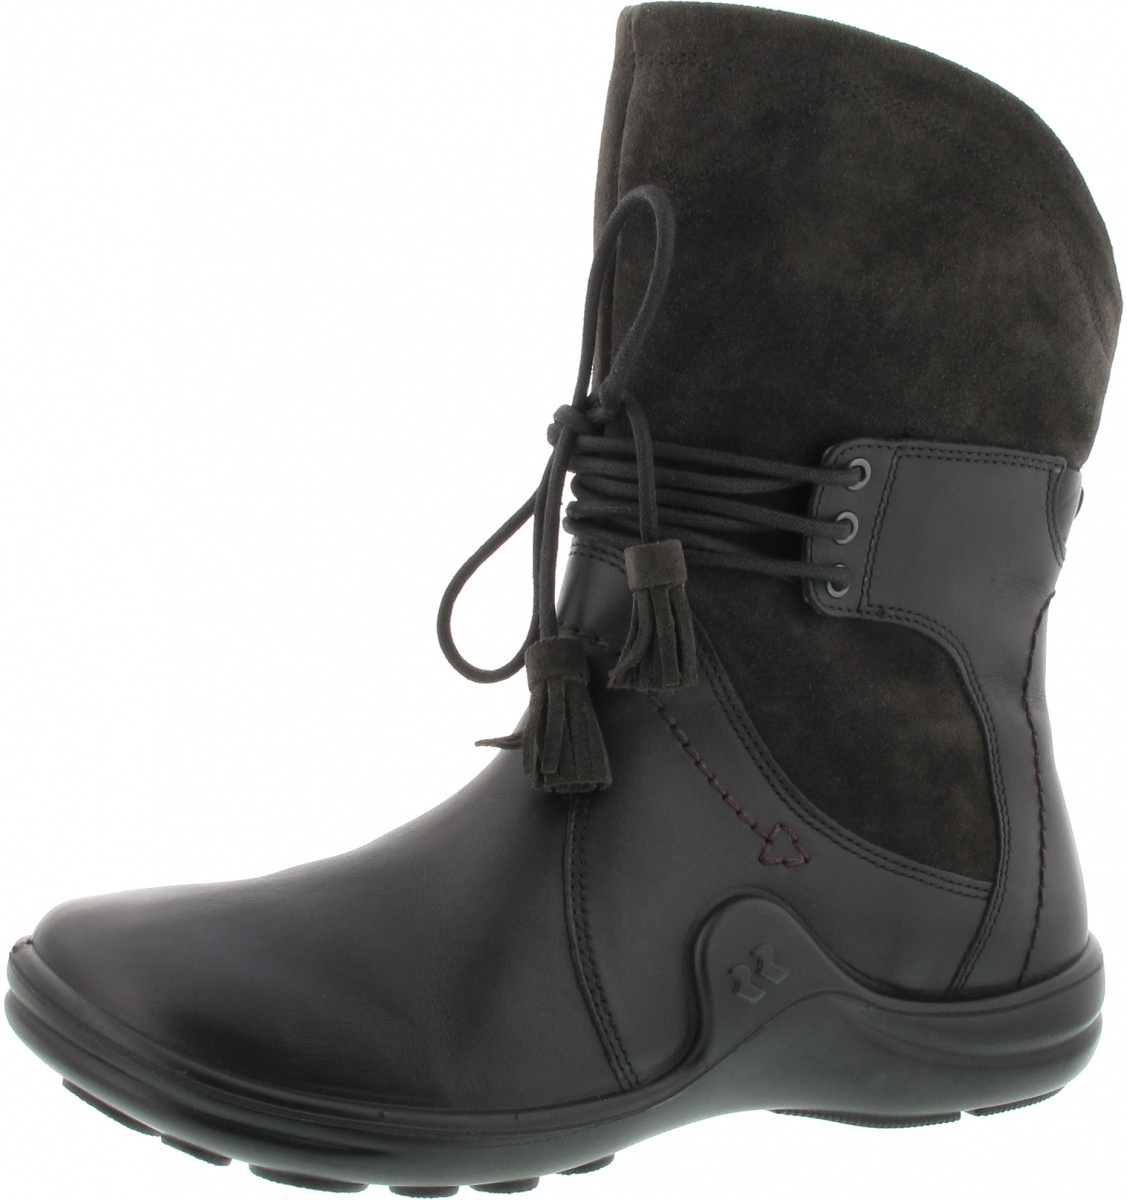 MUK LUKS Women's Amira Slippers: Schuhe & Handtaschen